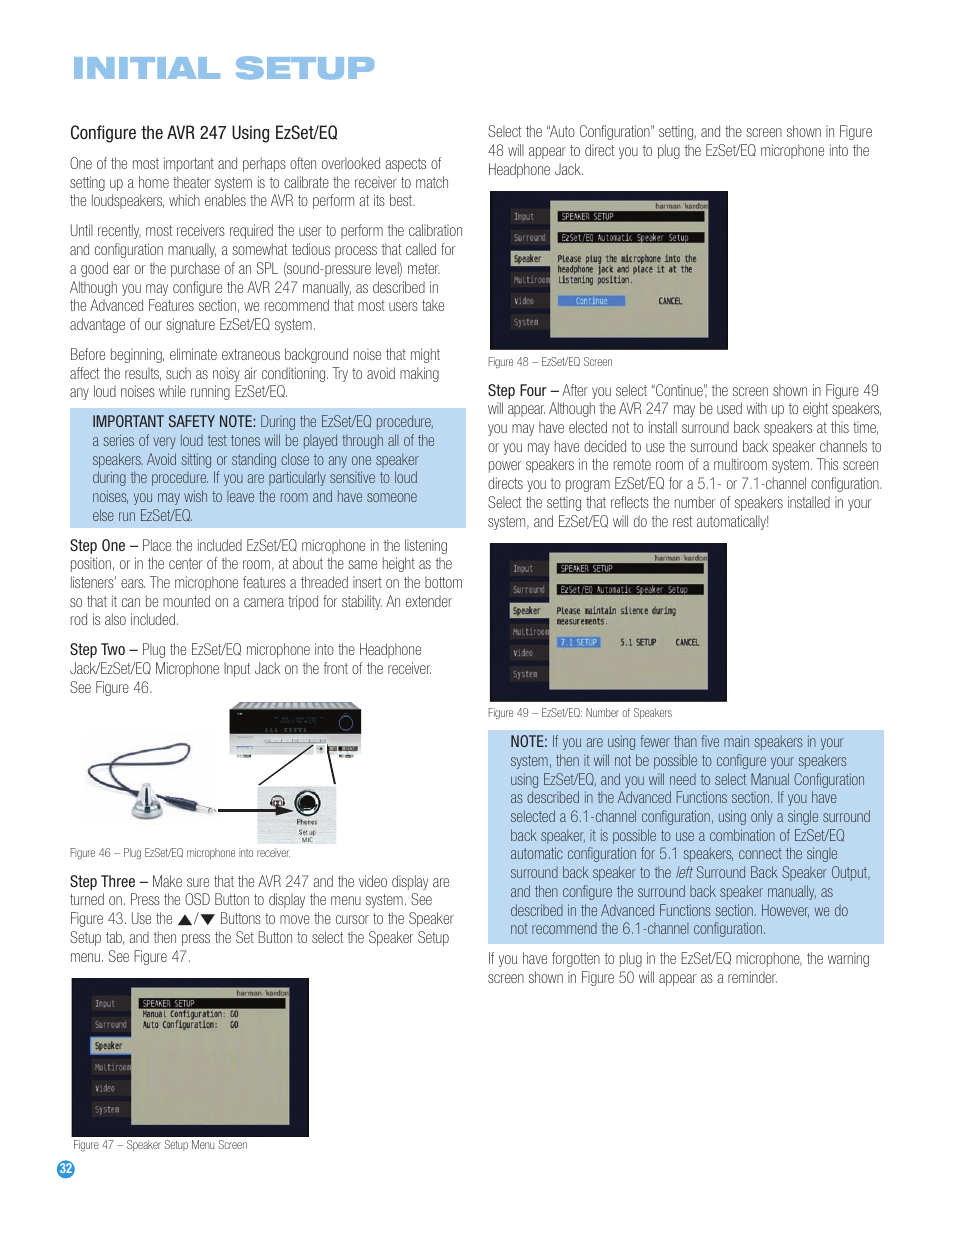 initial setup harman kardon avr 247 user manual page 32 76 rh manualsdir com Harman Kardon AVR 247 Problems Harman Kardon AVR 247 Manual